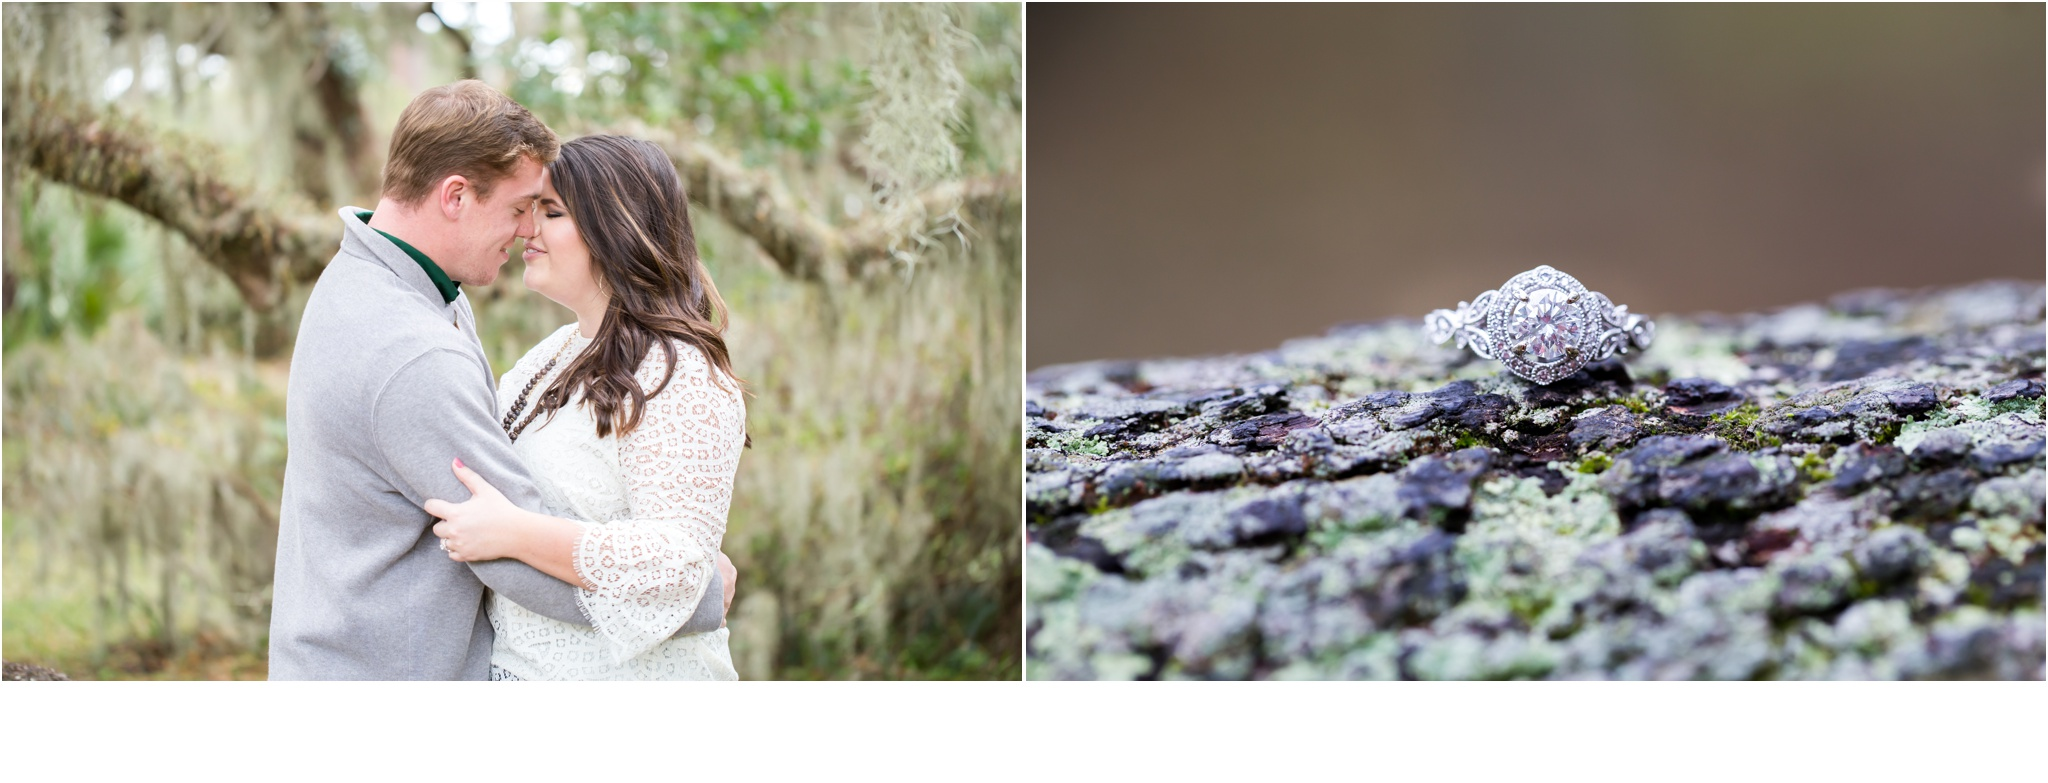 Rainey_Gregg_Photography_St._Simons_Island_Georgia_California_Wedding_Portrait_Photography_0583.jpg